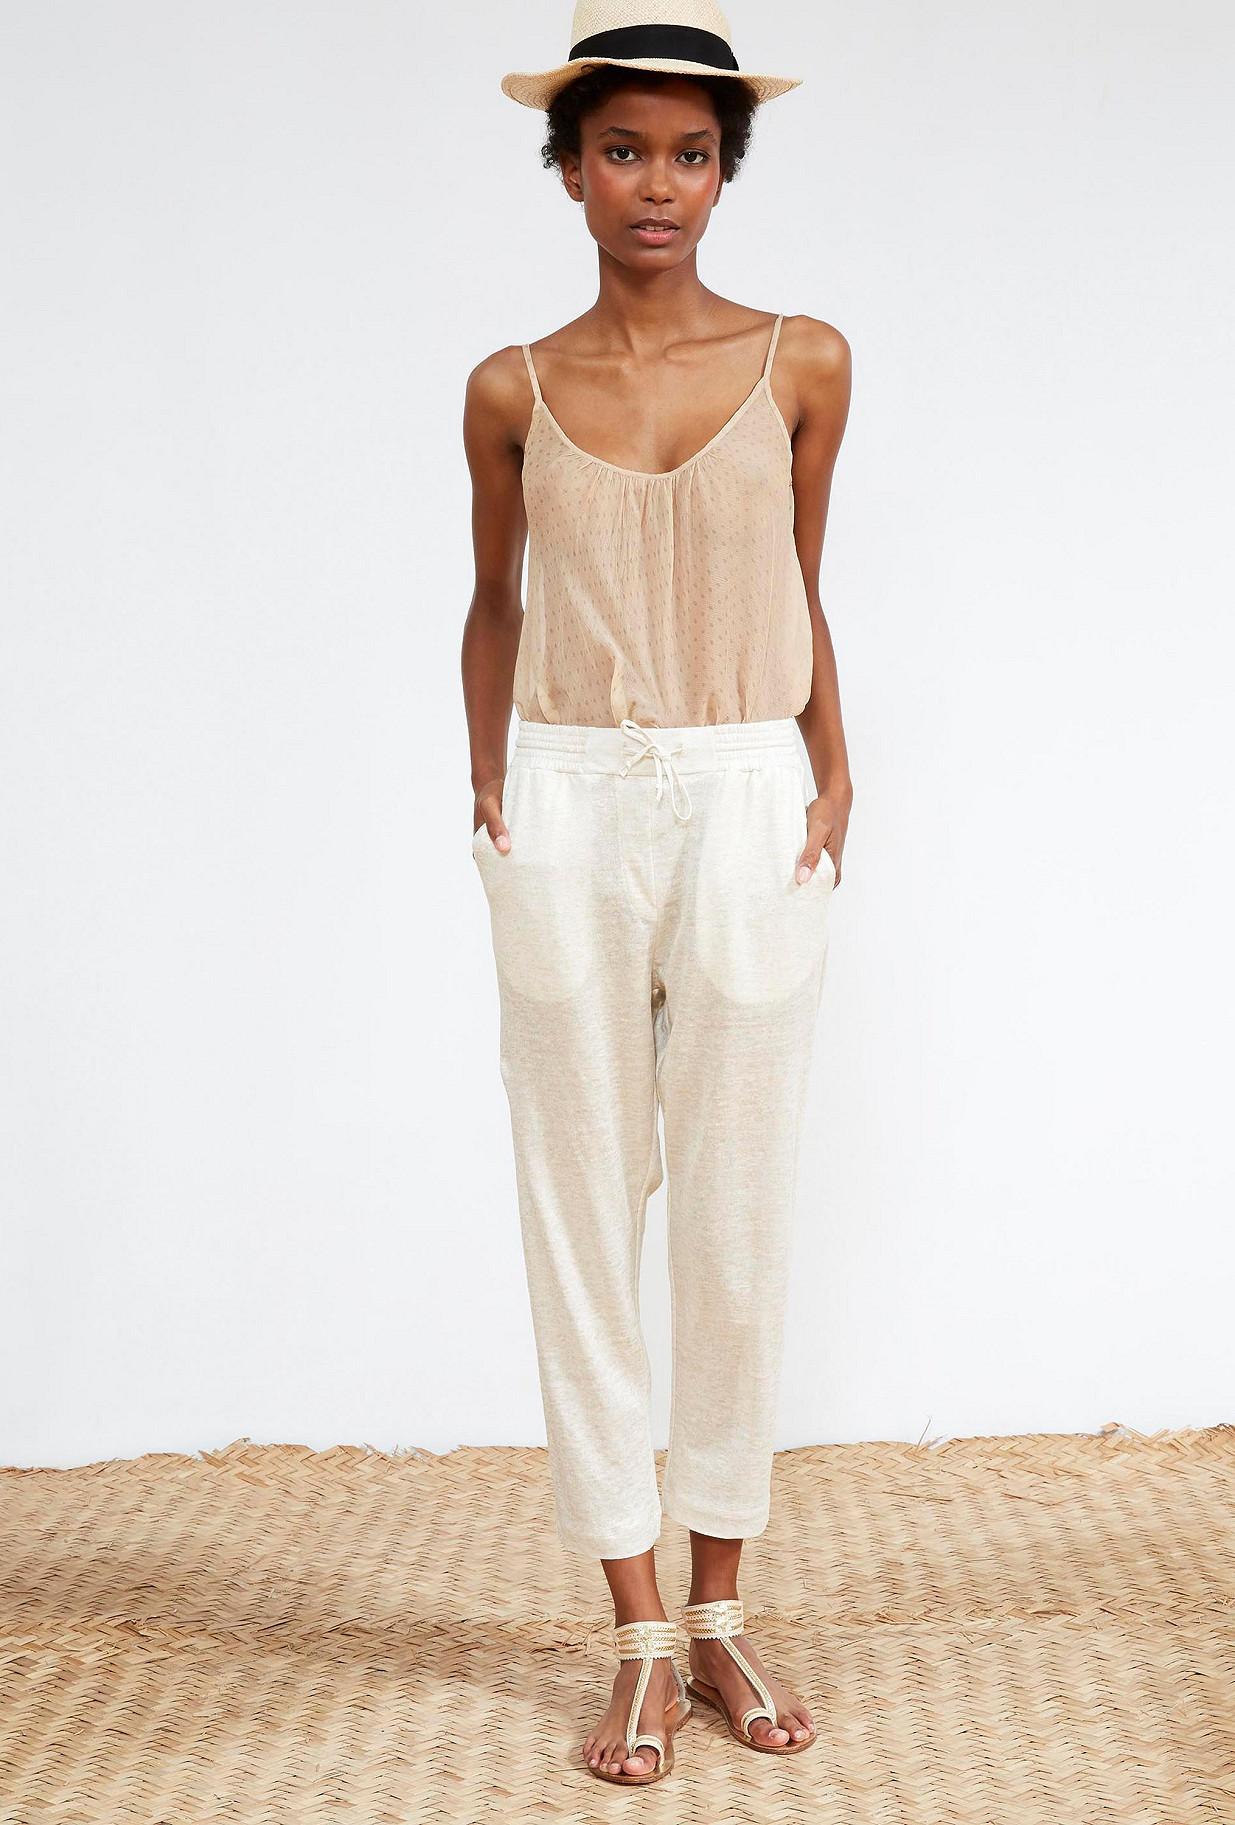 clothes store CHAUSSURES  Sheeba Queen french designer fashion Paris